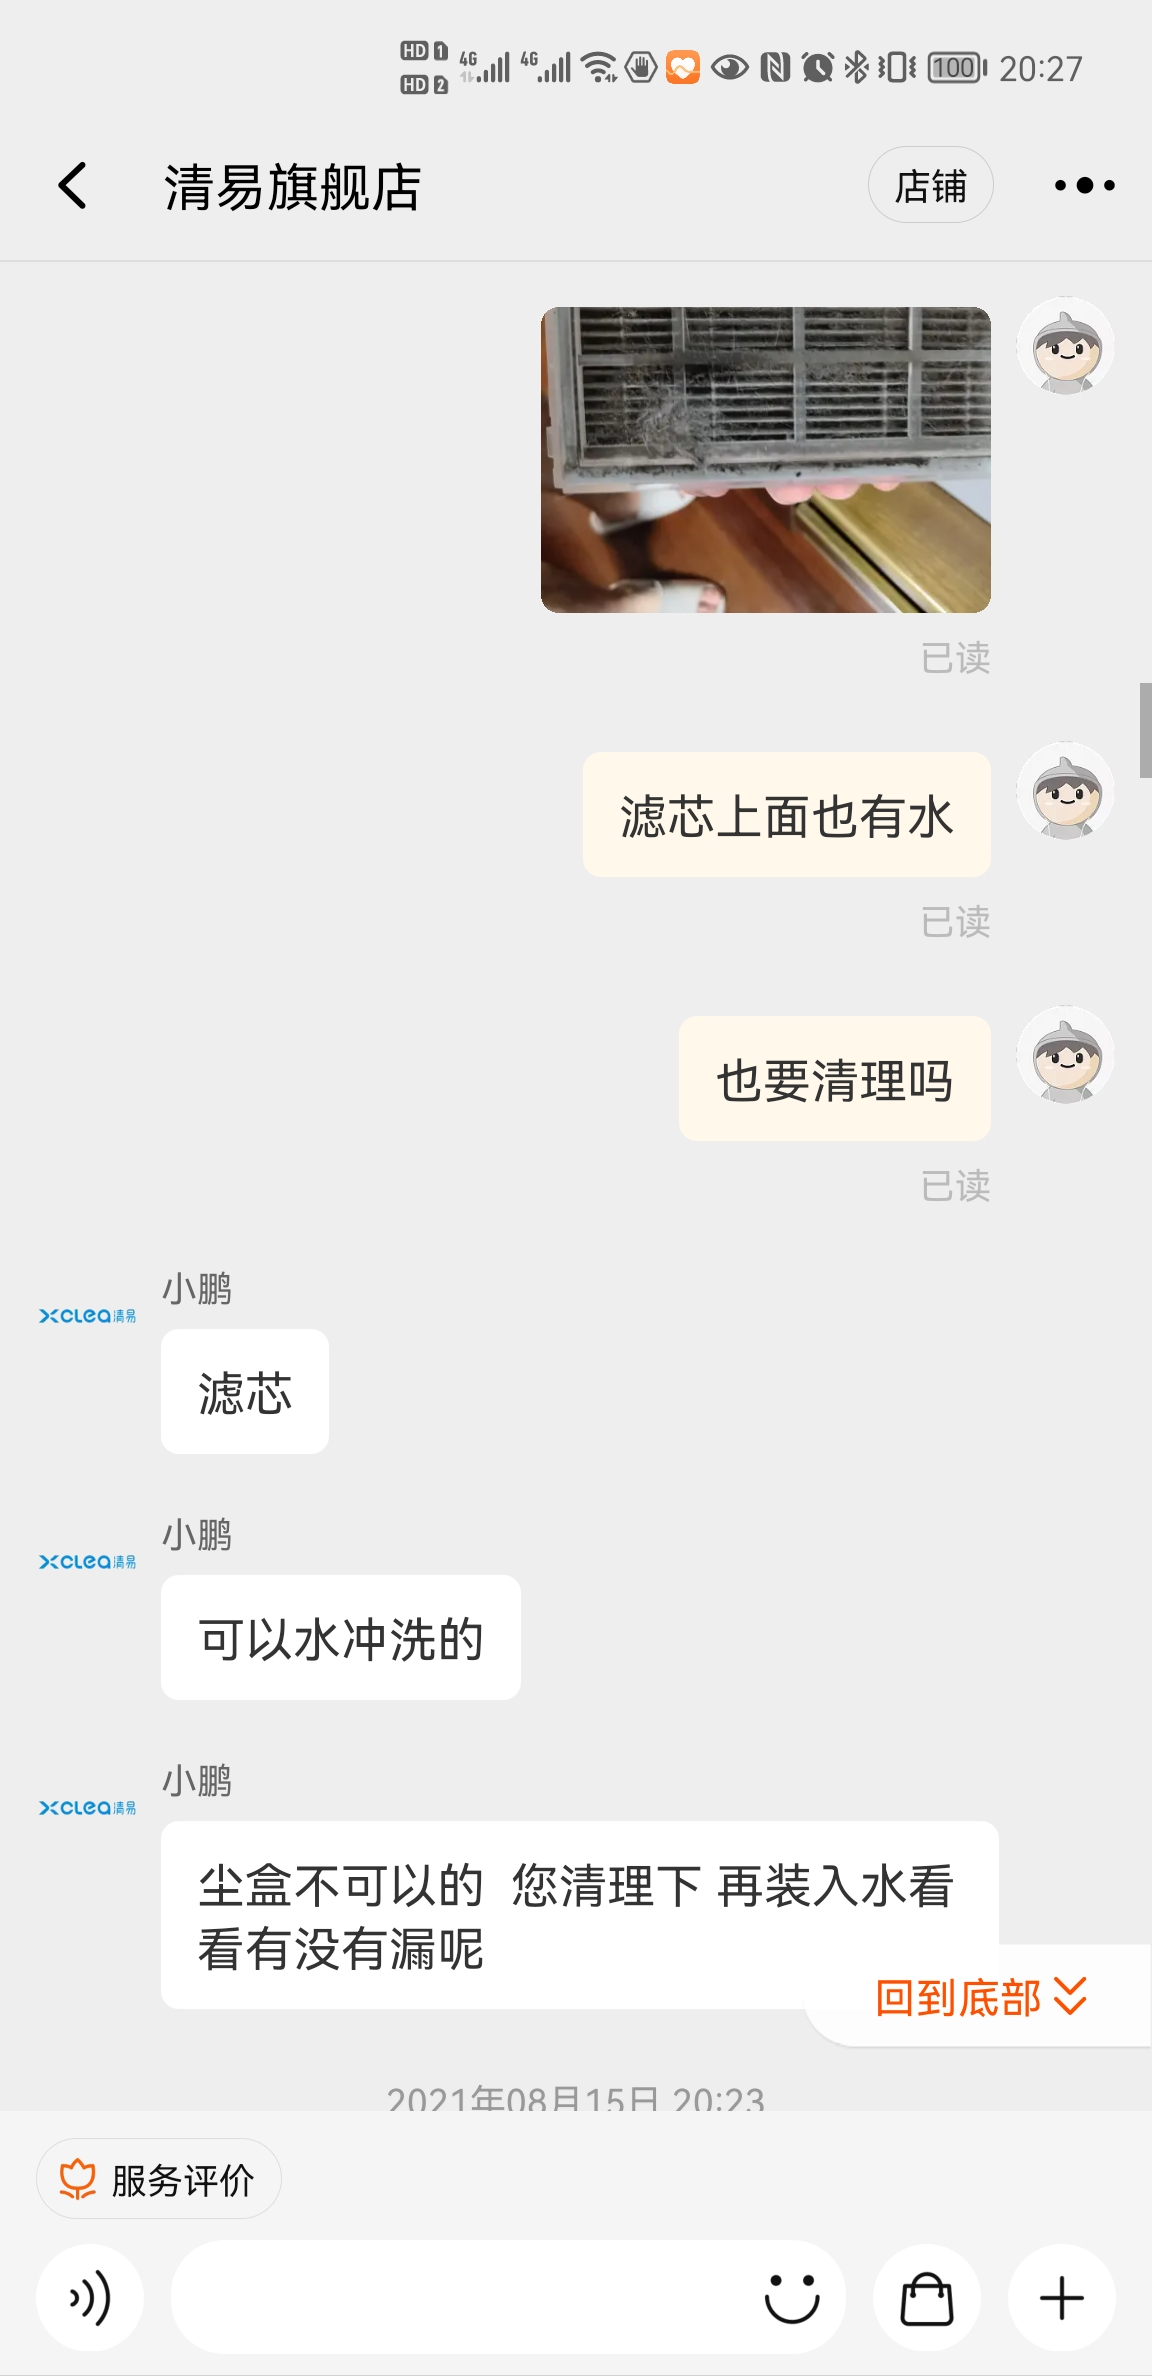 Screenshot_20210903_202725_com.taobao.taobao.jpg